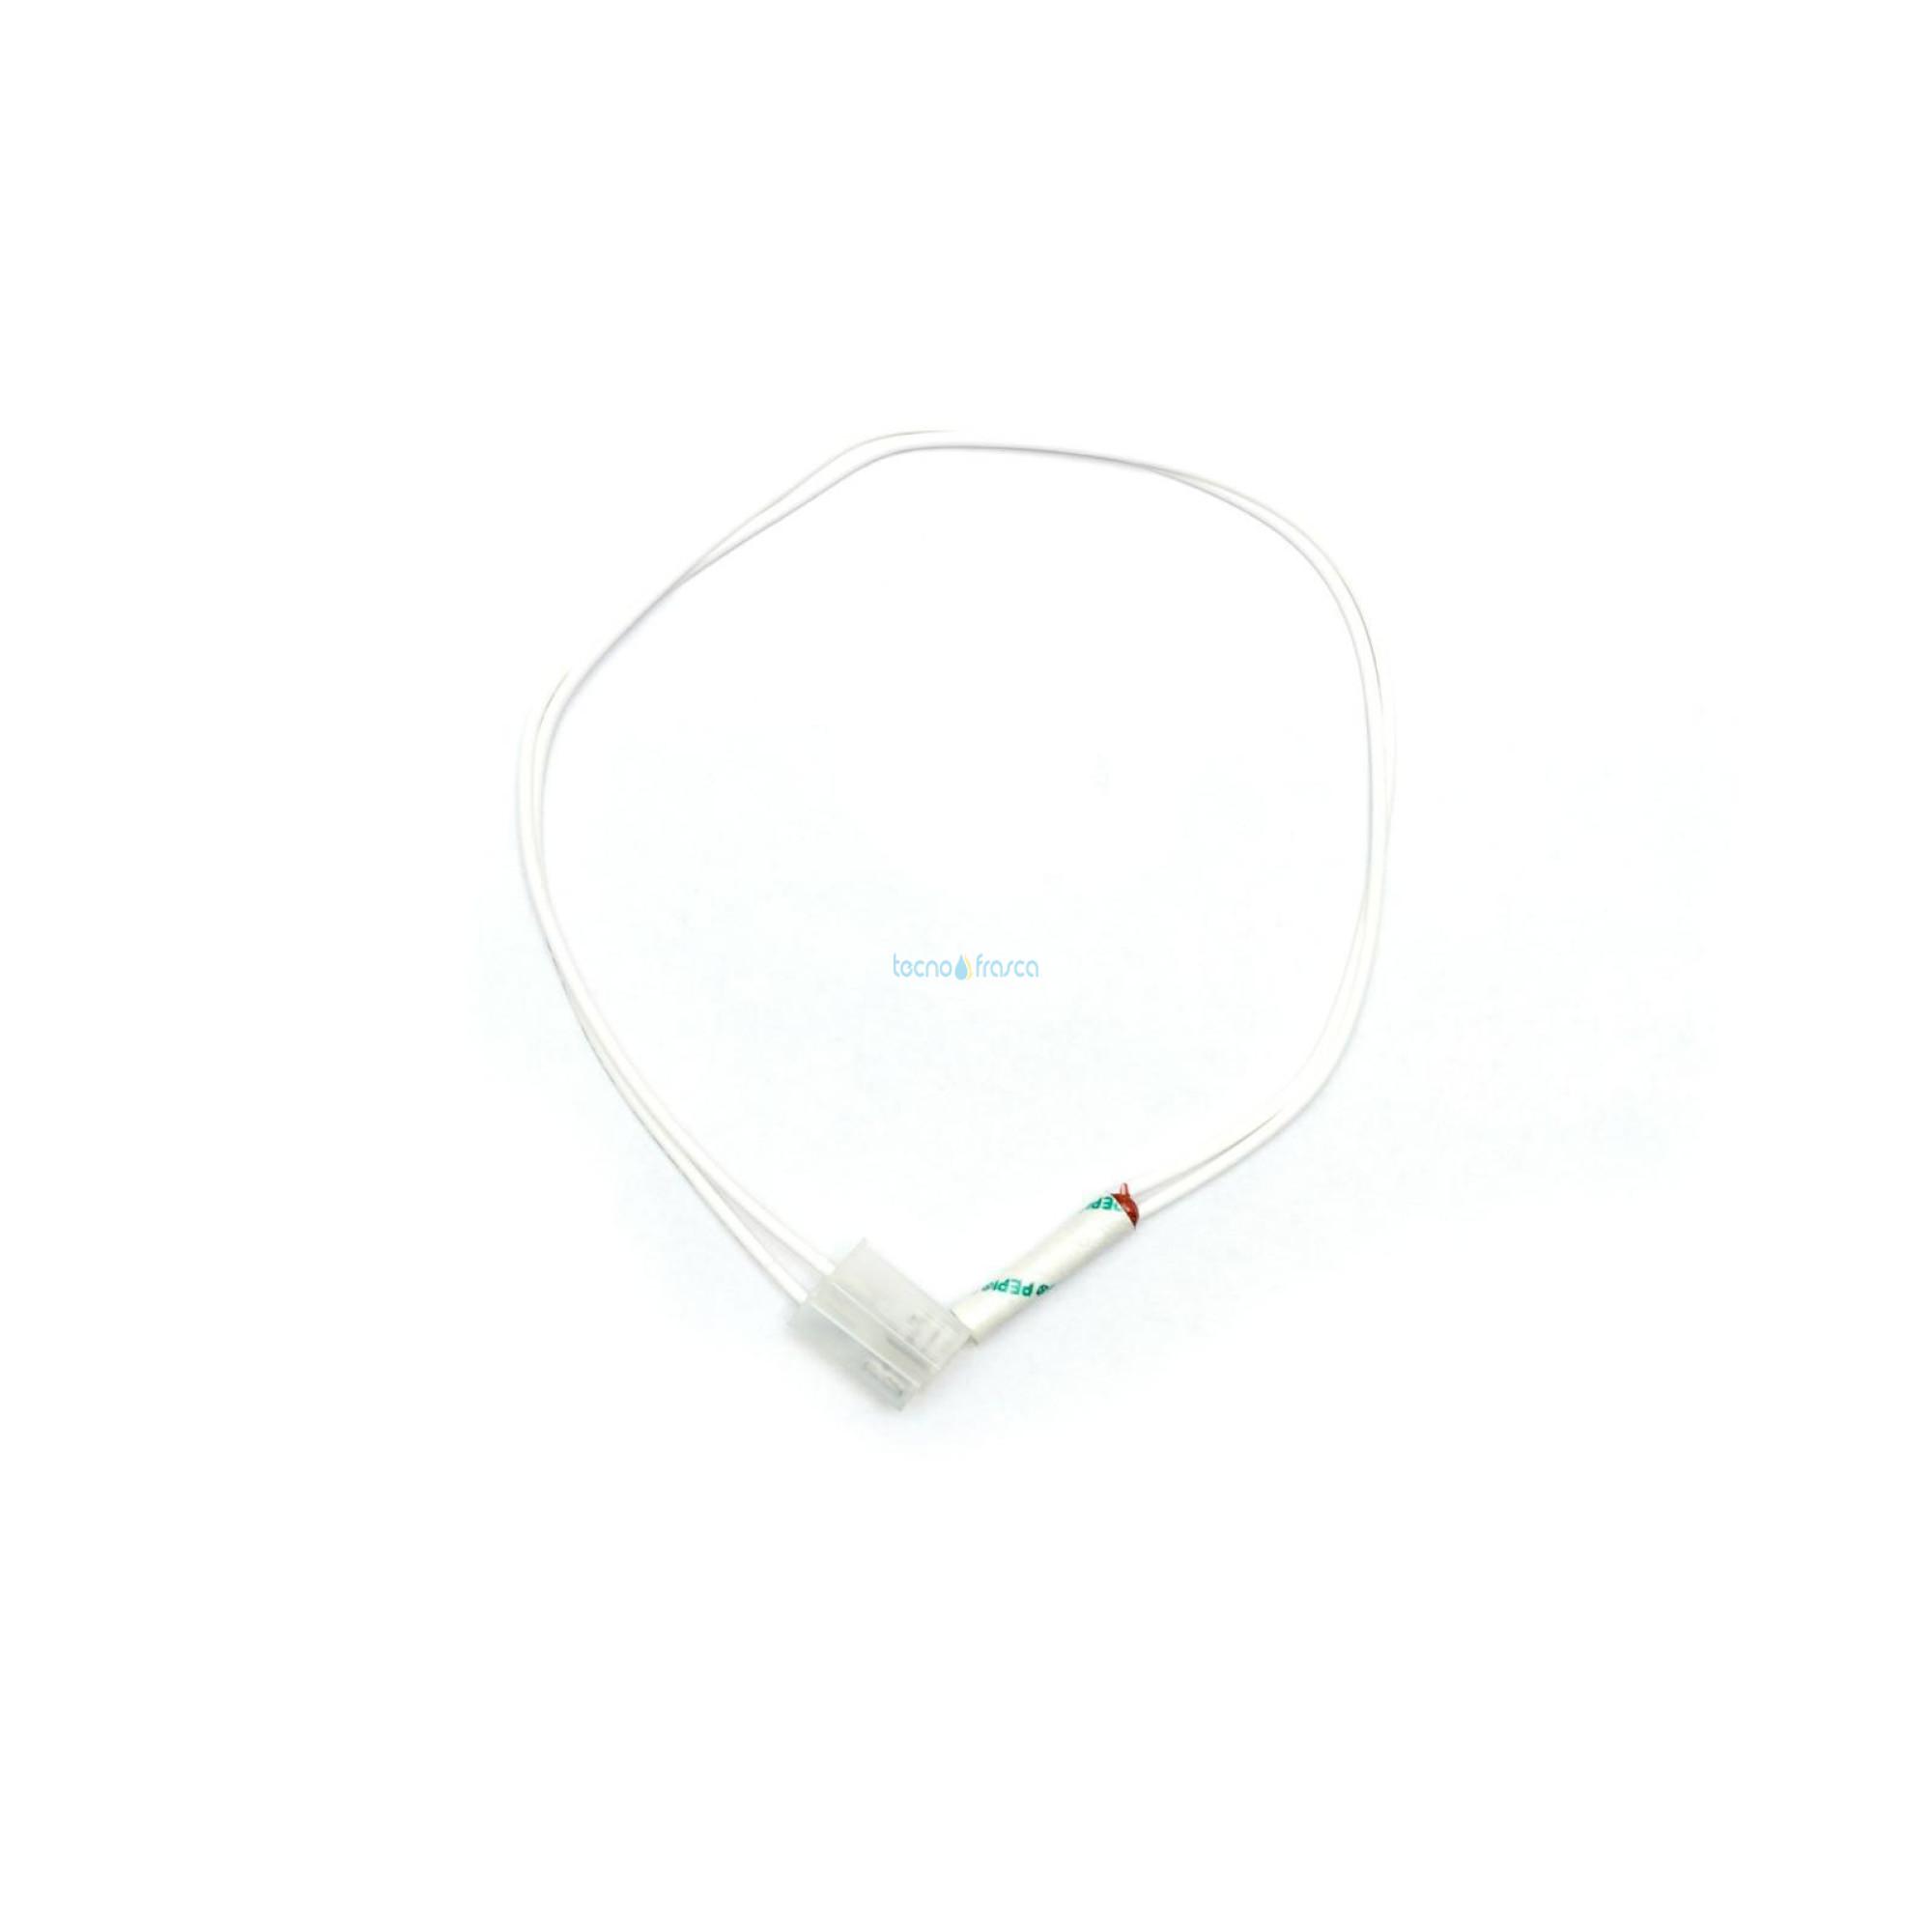 Sylber termostato bruciatore R10026721